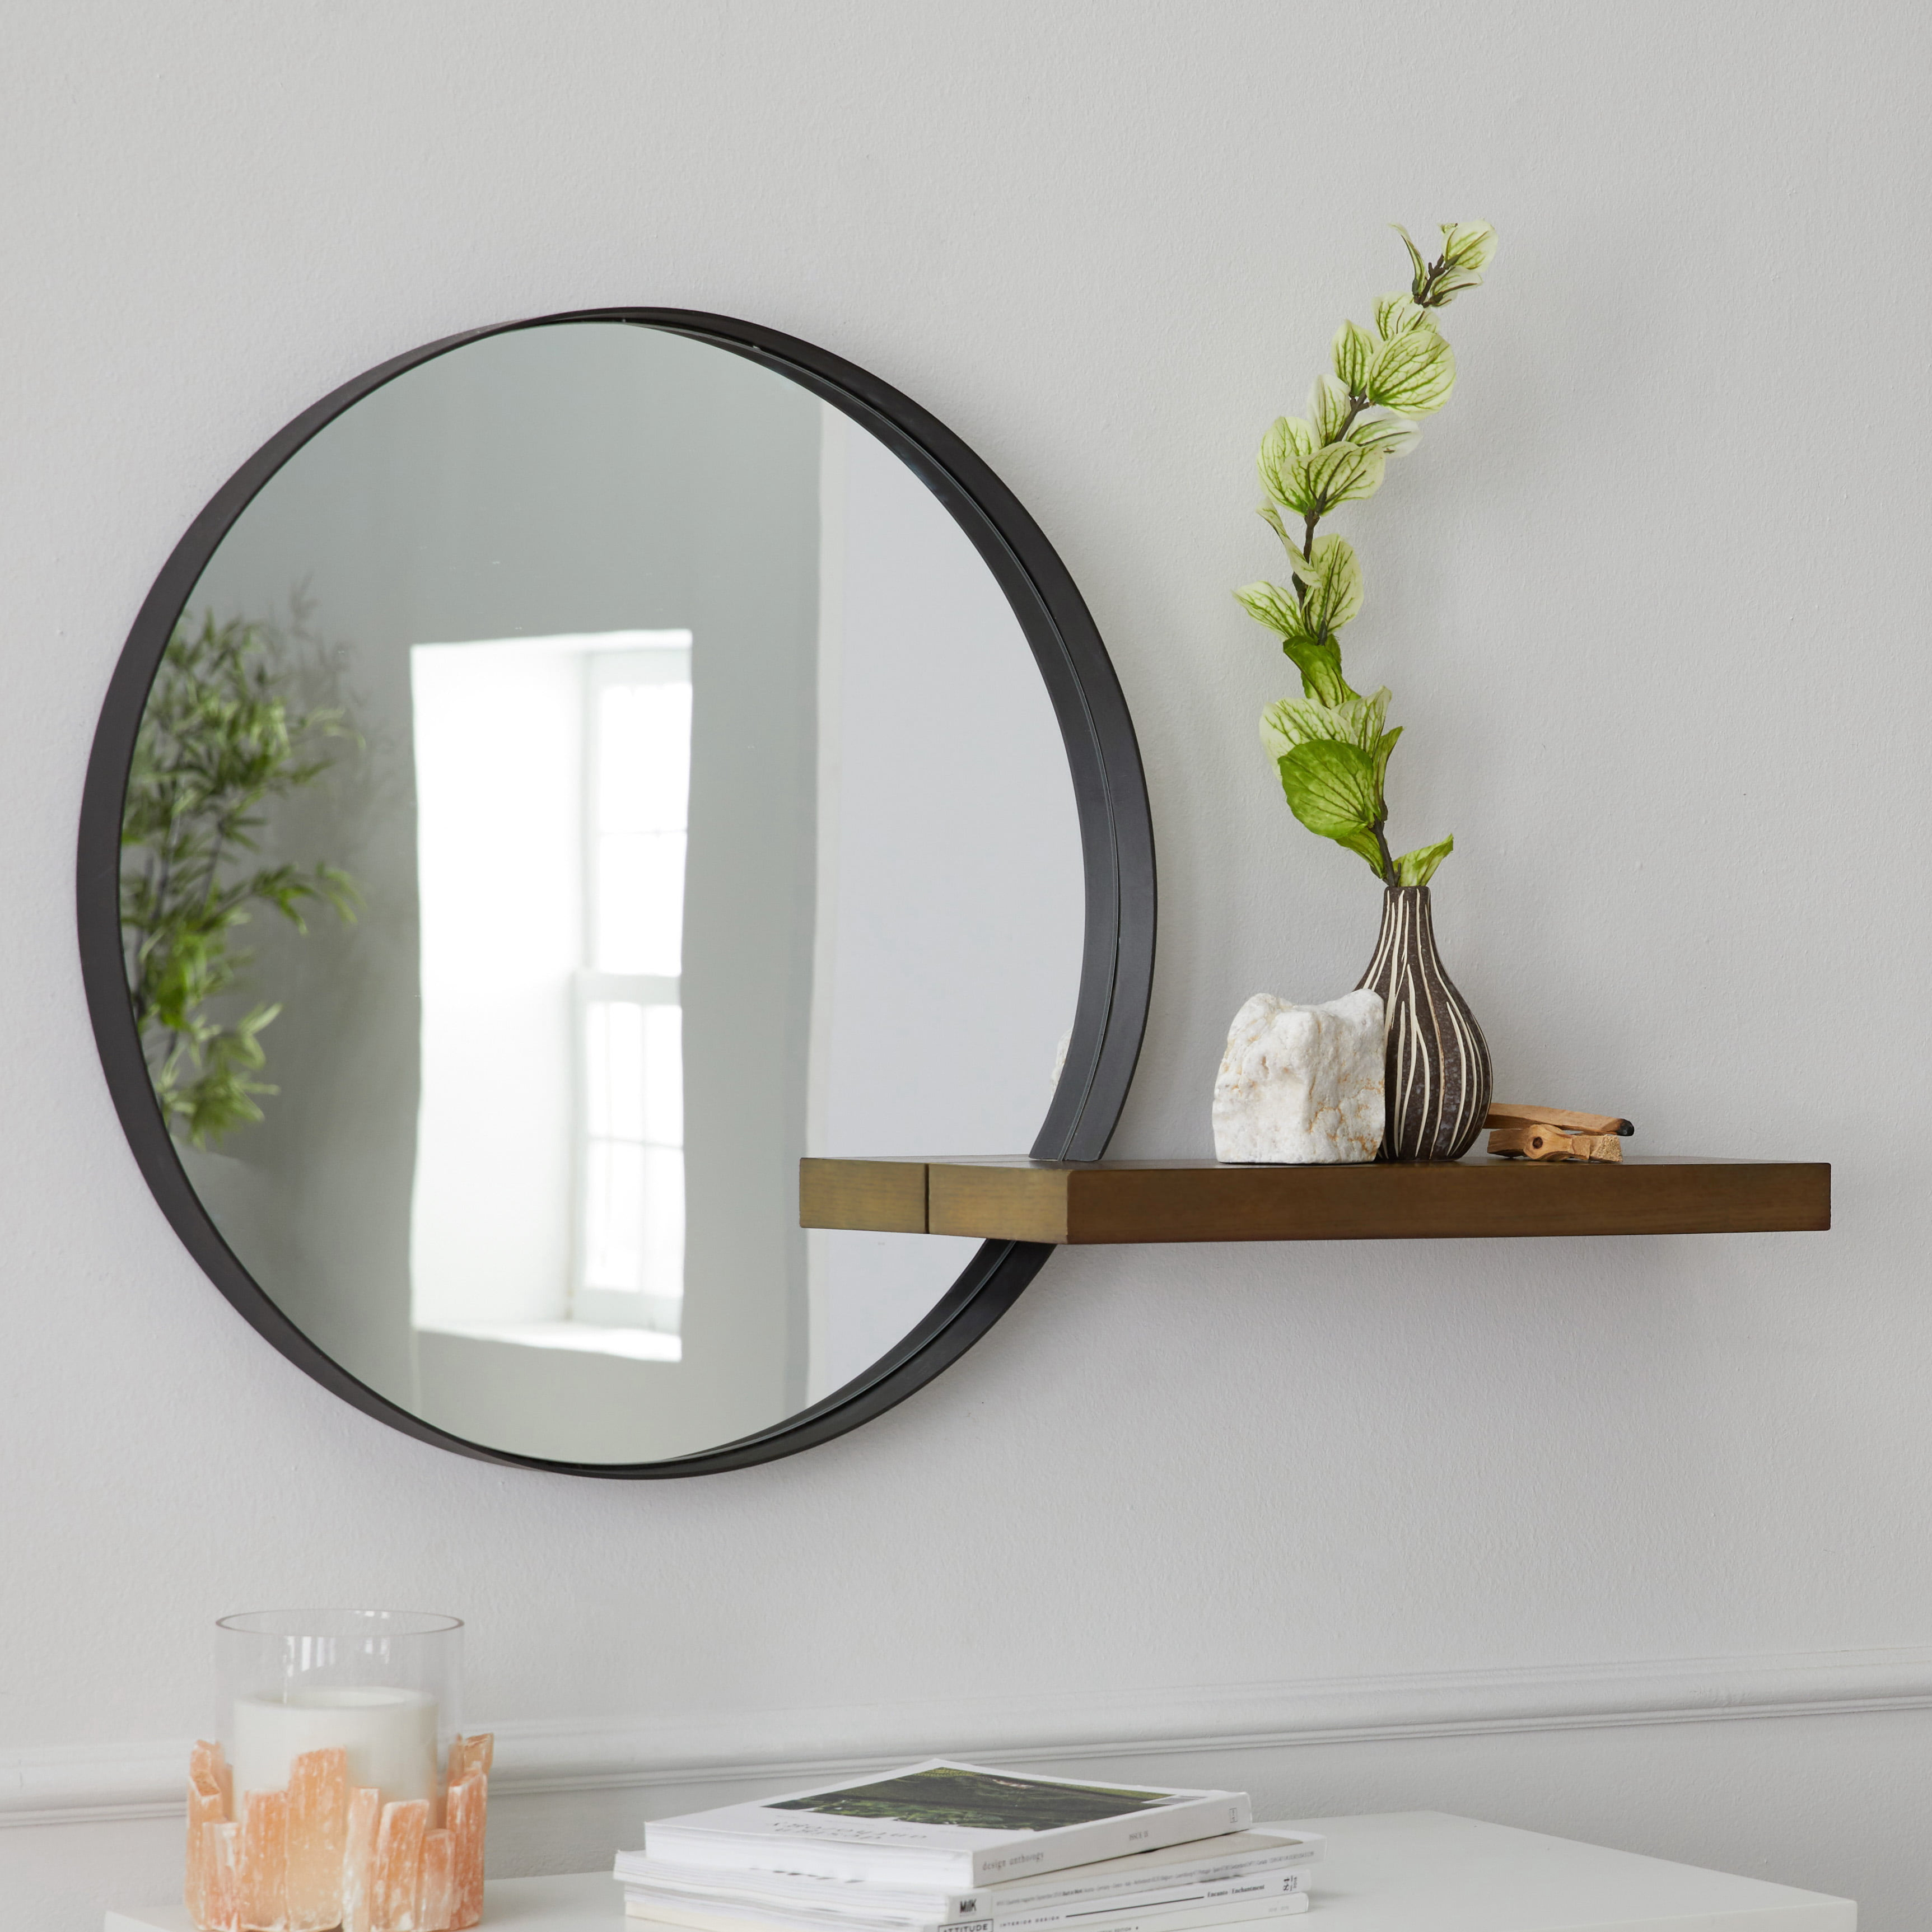 Modrn Naturals Metal Framed Round Decorative Wall Mirror With Wood Shelf Walmart Com Walmart Com